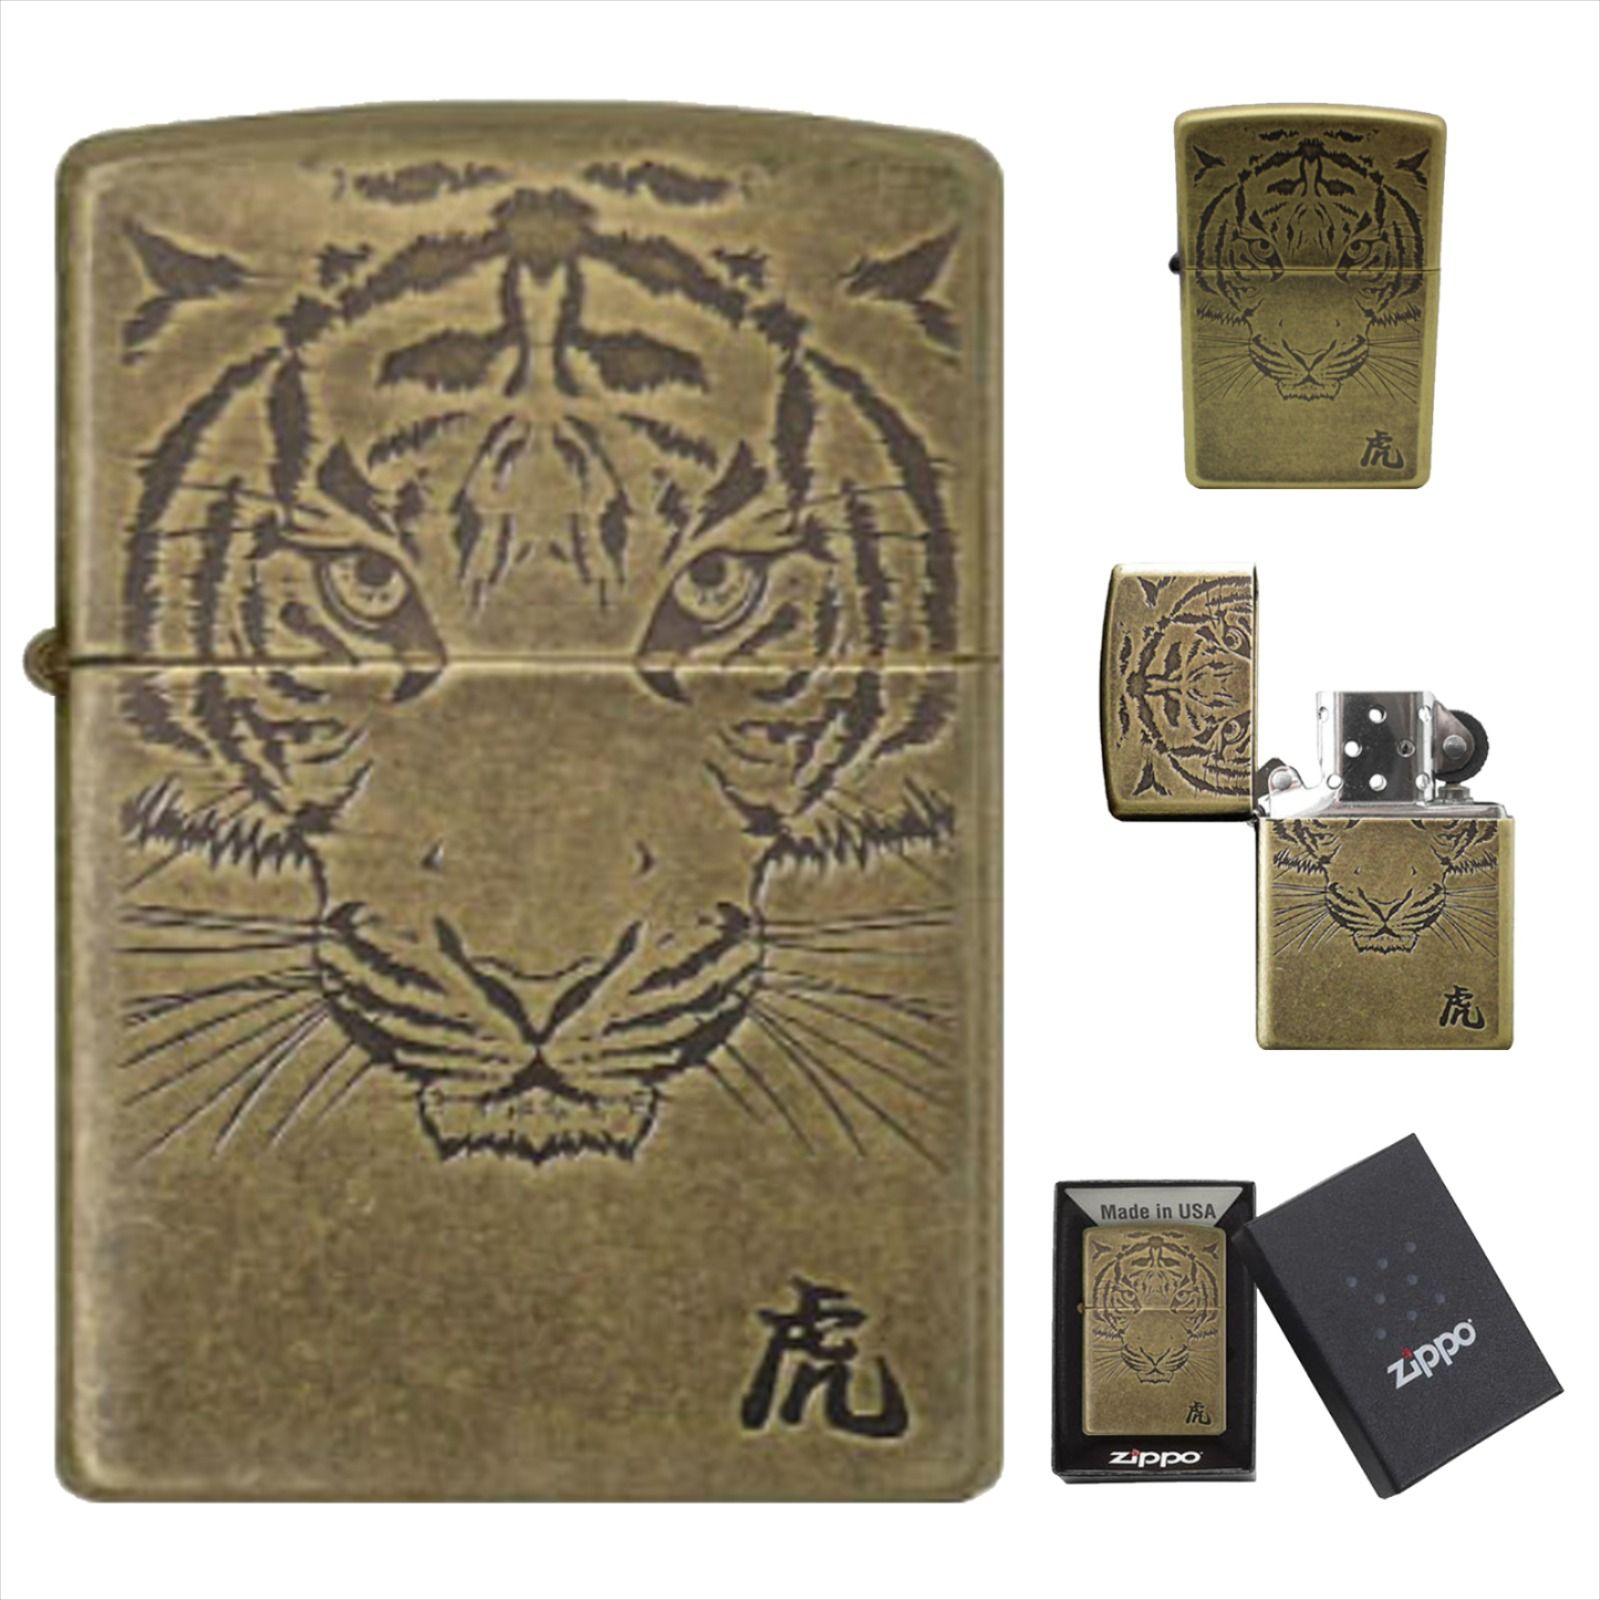 Zippo Lighter Tiger Face Bra Antique Brass Emblem Windproof Original Gift Ebay In 2020 Zippo Lighter Zippo Tiger Face